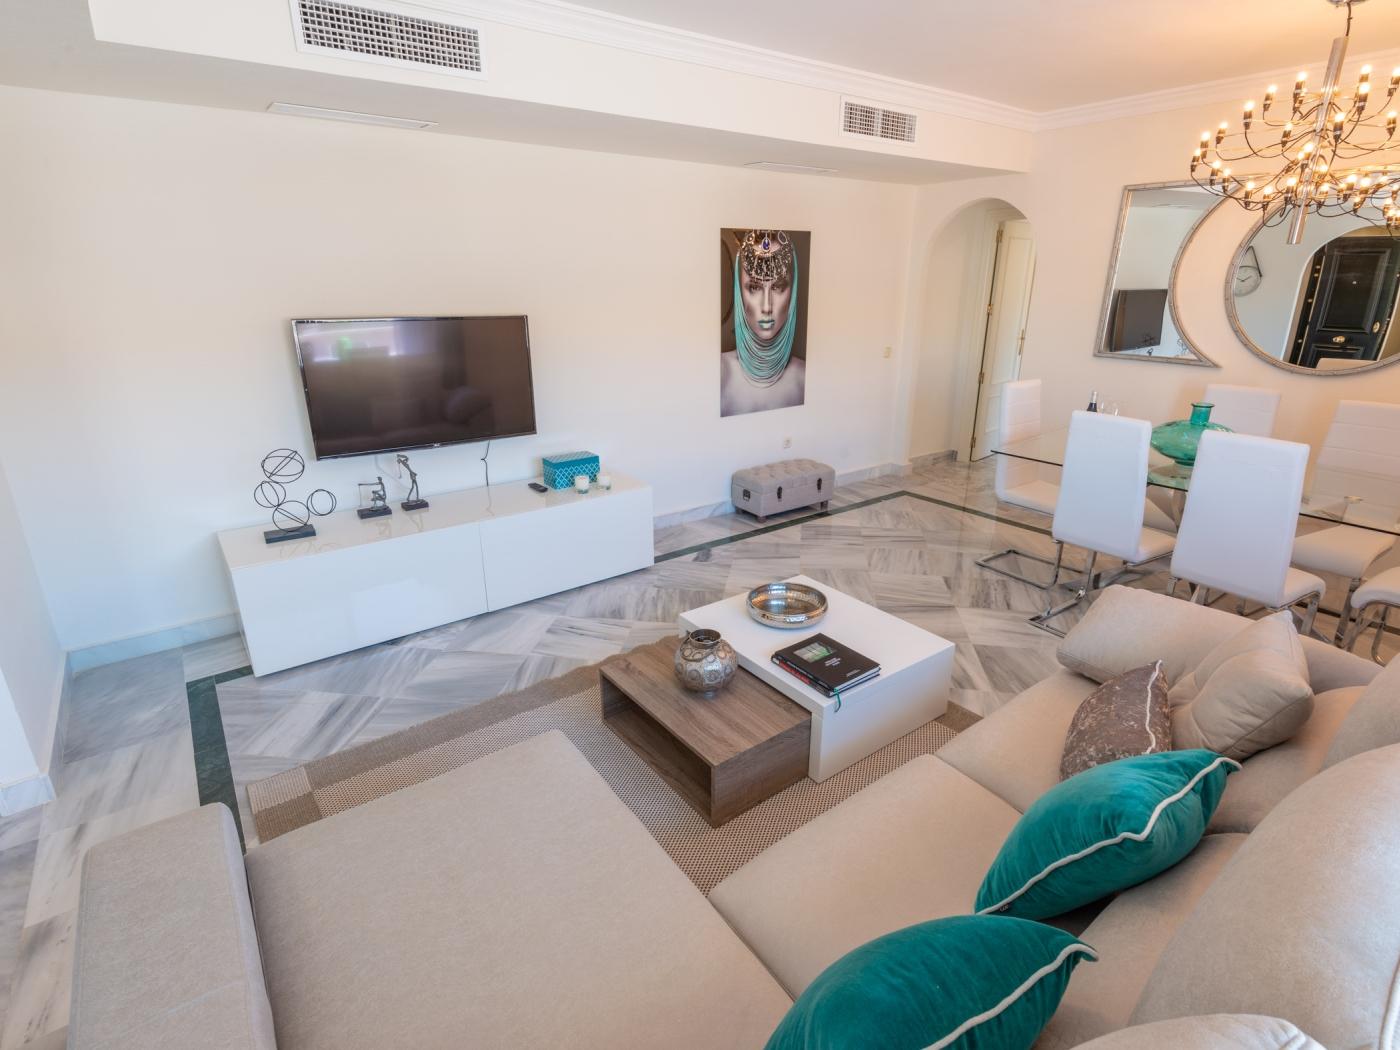 La Dama De Noche Penthouse (3 Bedrooms)